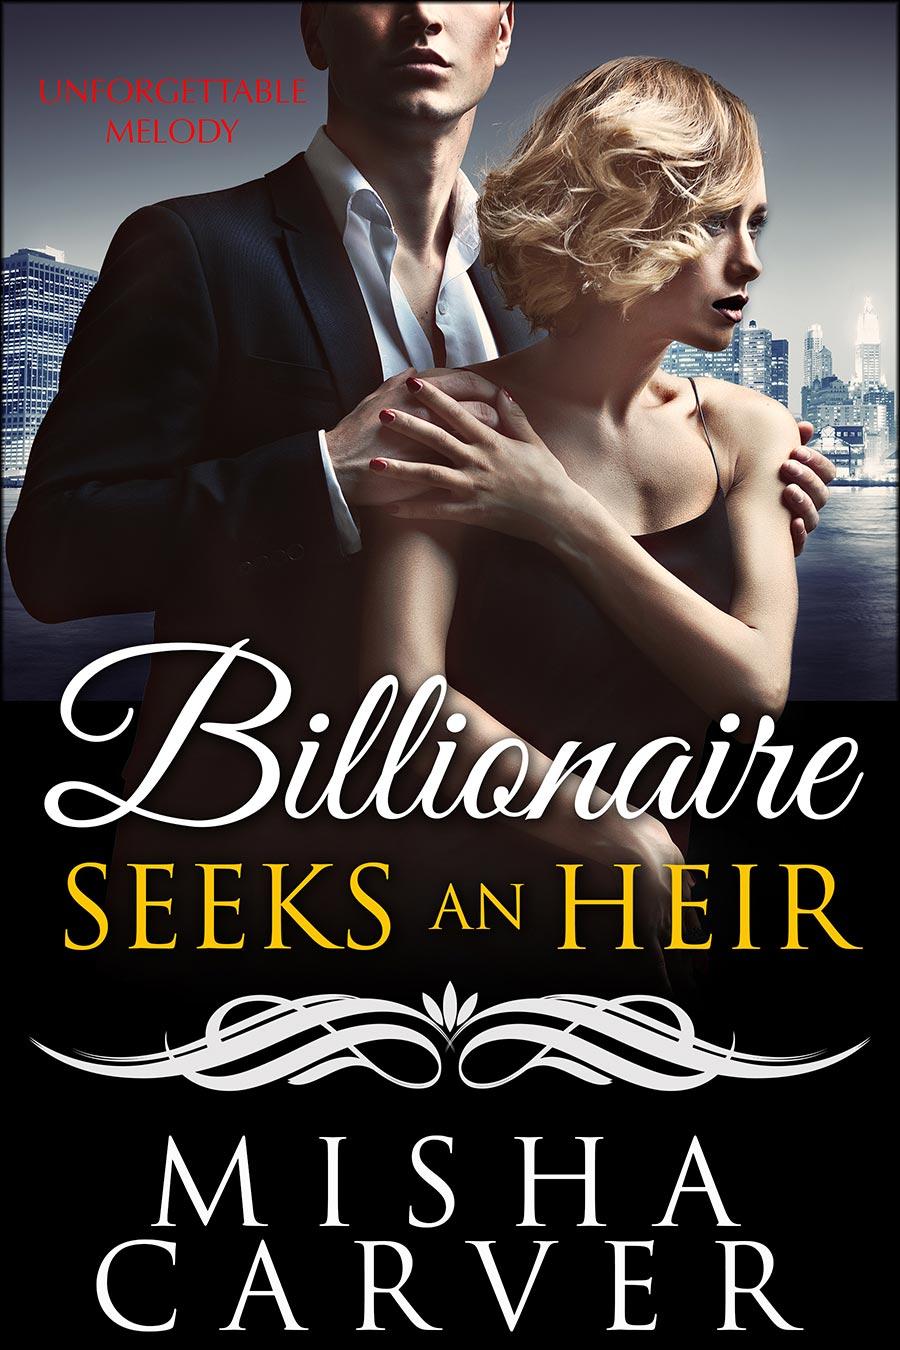 Billionaire-Seeks-an-Heir-3.jpg